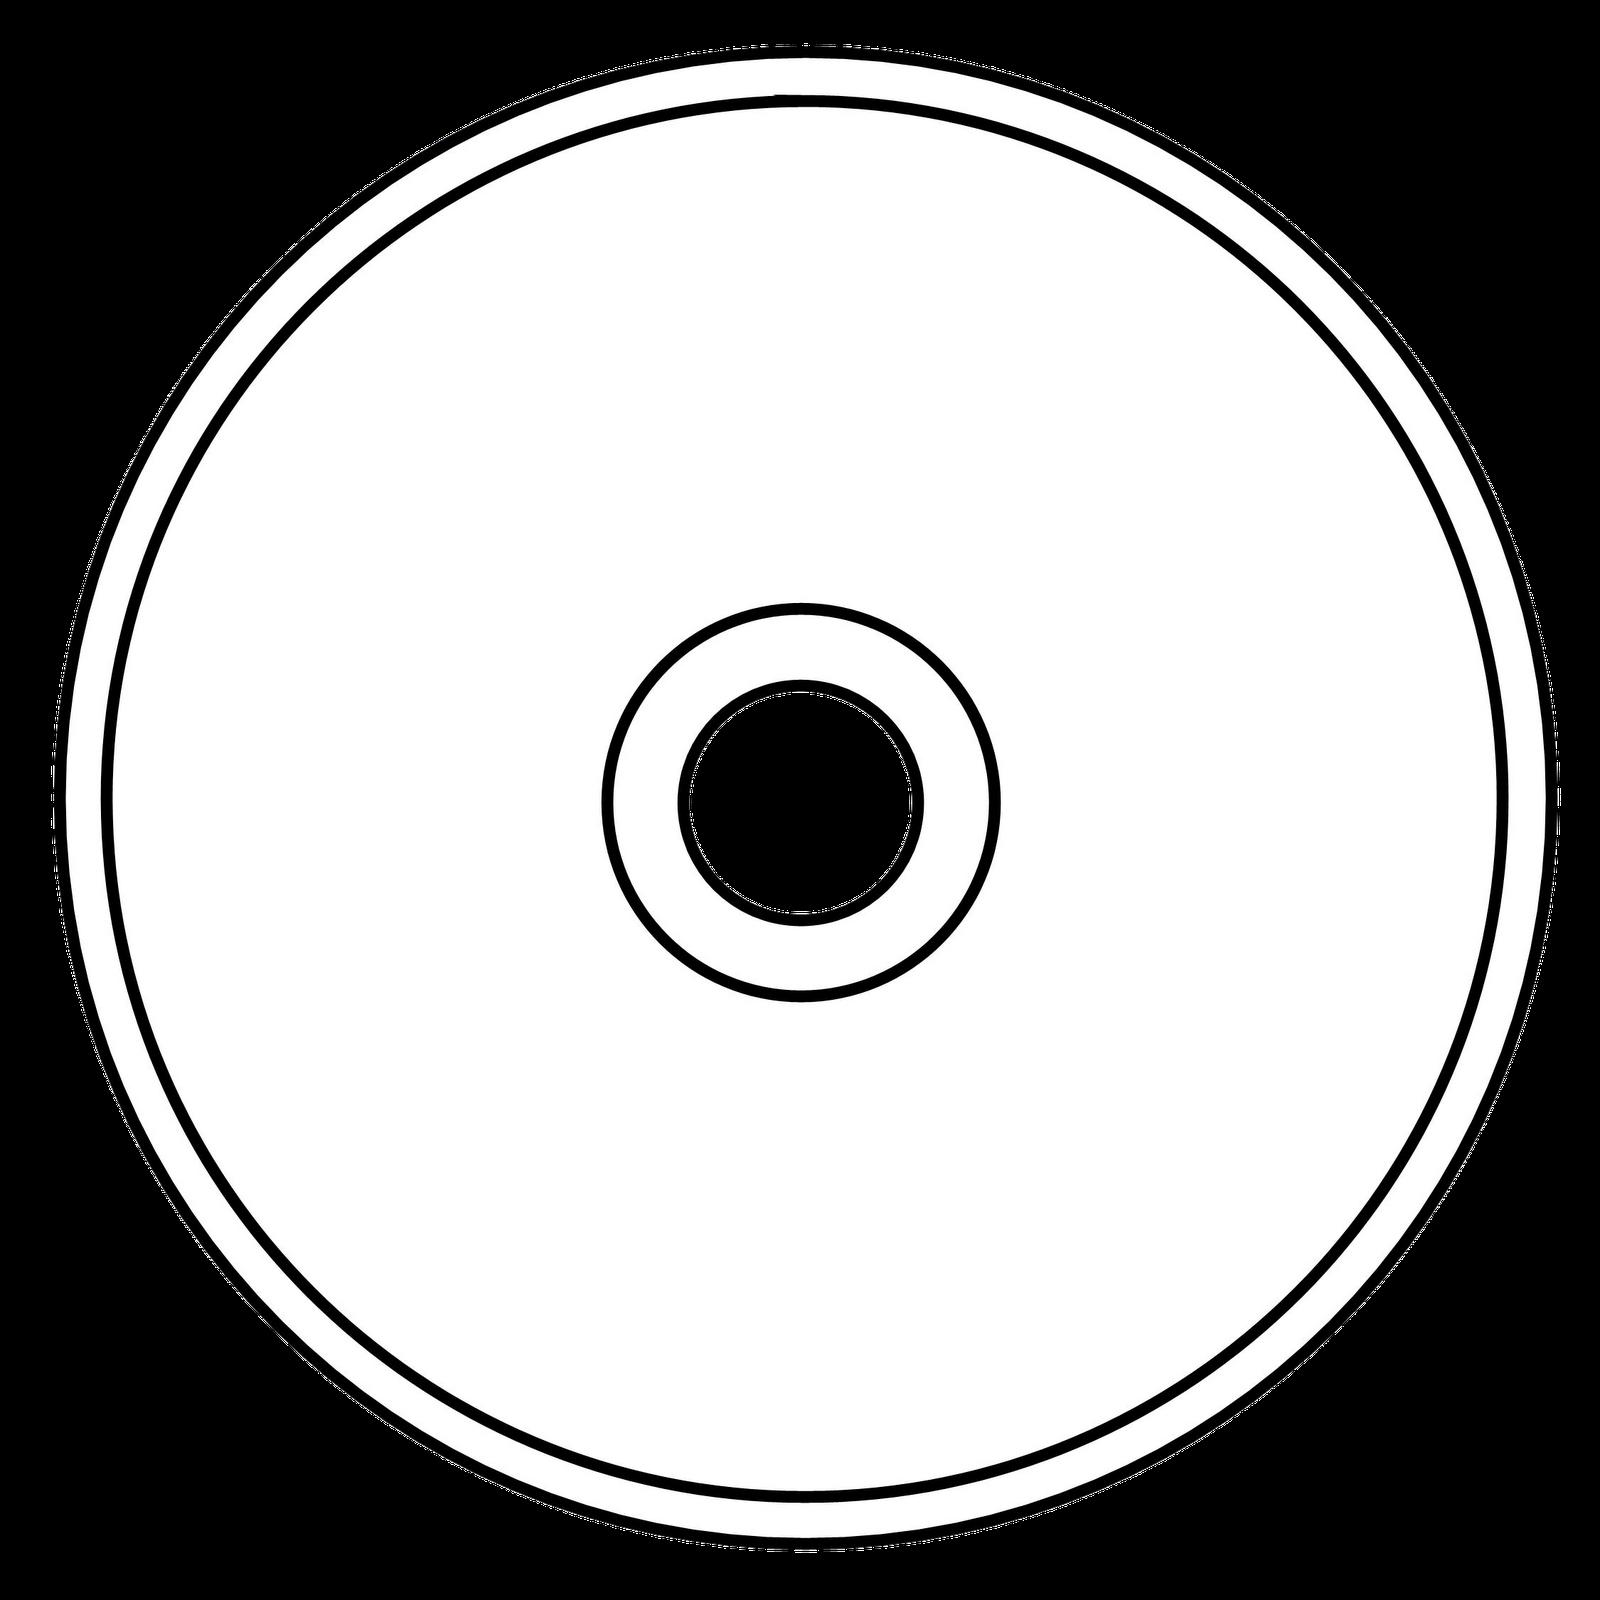 Compact Disc Clipart - Clipart Kid